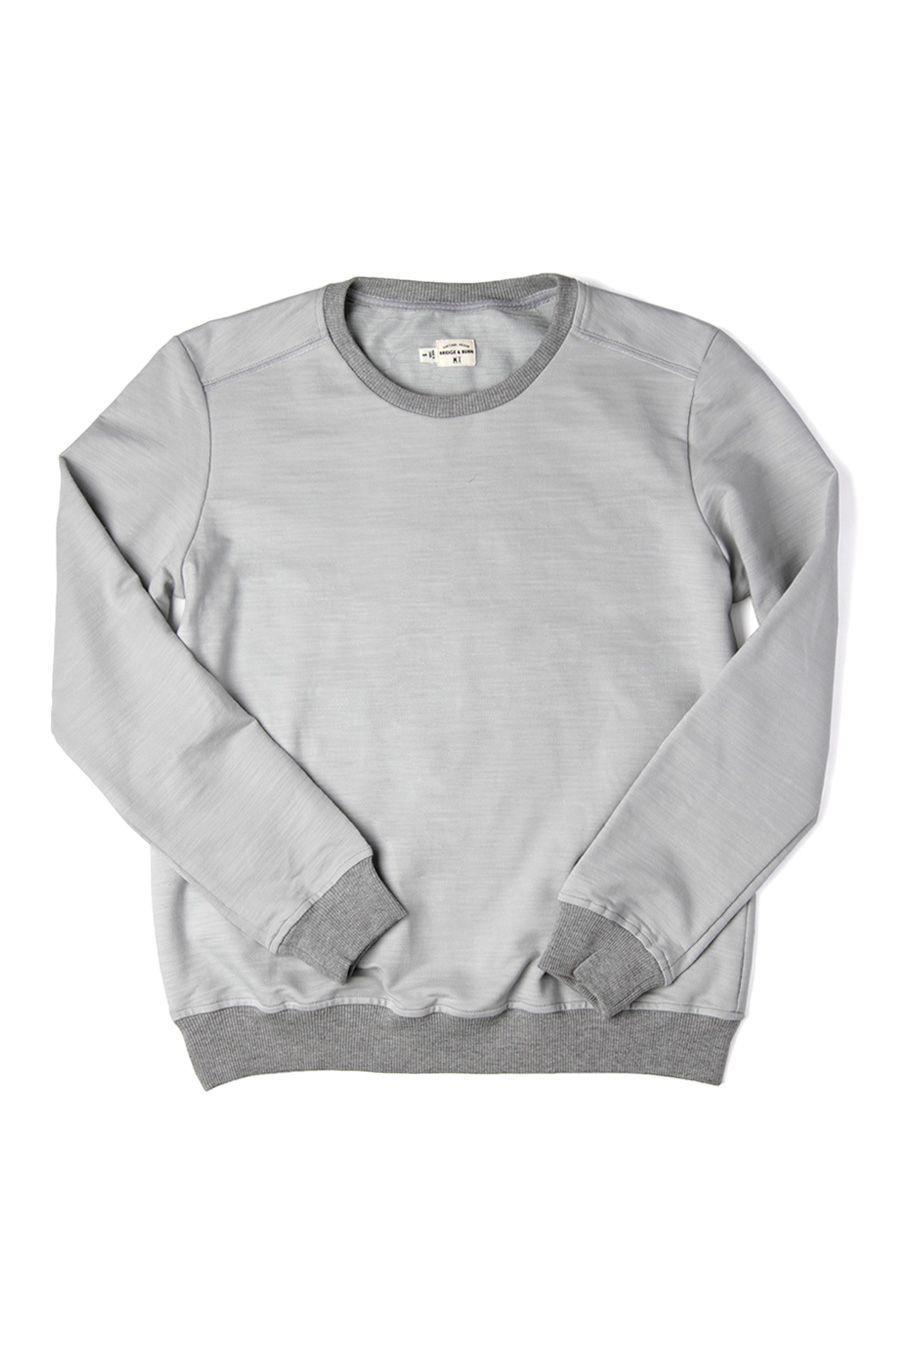 Nina Light Grey Crewneck Sweatshirt By Bridge Burn Grey Sweatshirt Women Bridge Burn Grey Crewneck [ 1350 x 900 Pixel ]